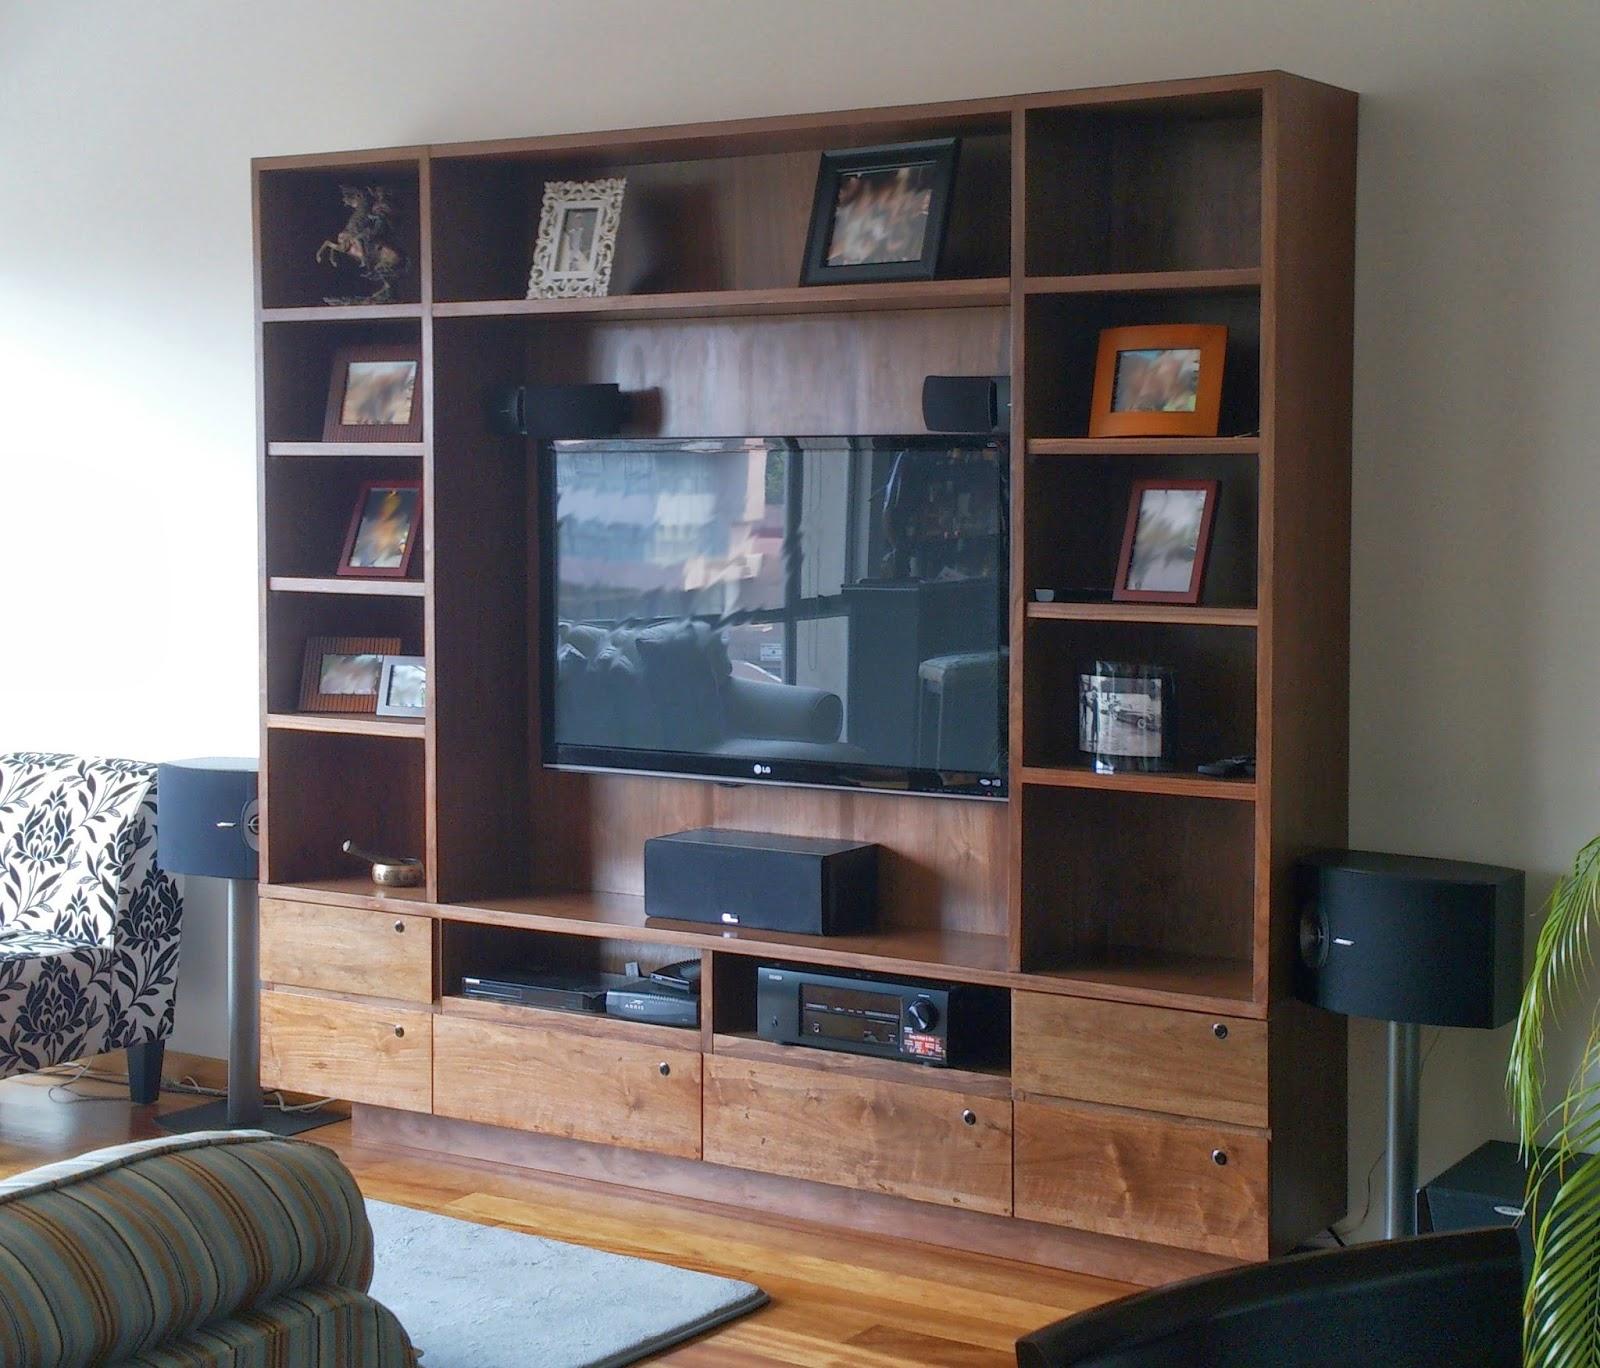 Centro de entretenimiento minimalista car interior design for Muebles diseno minimalista